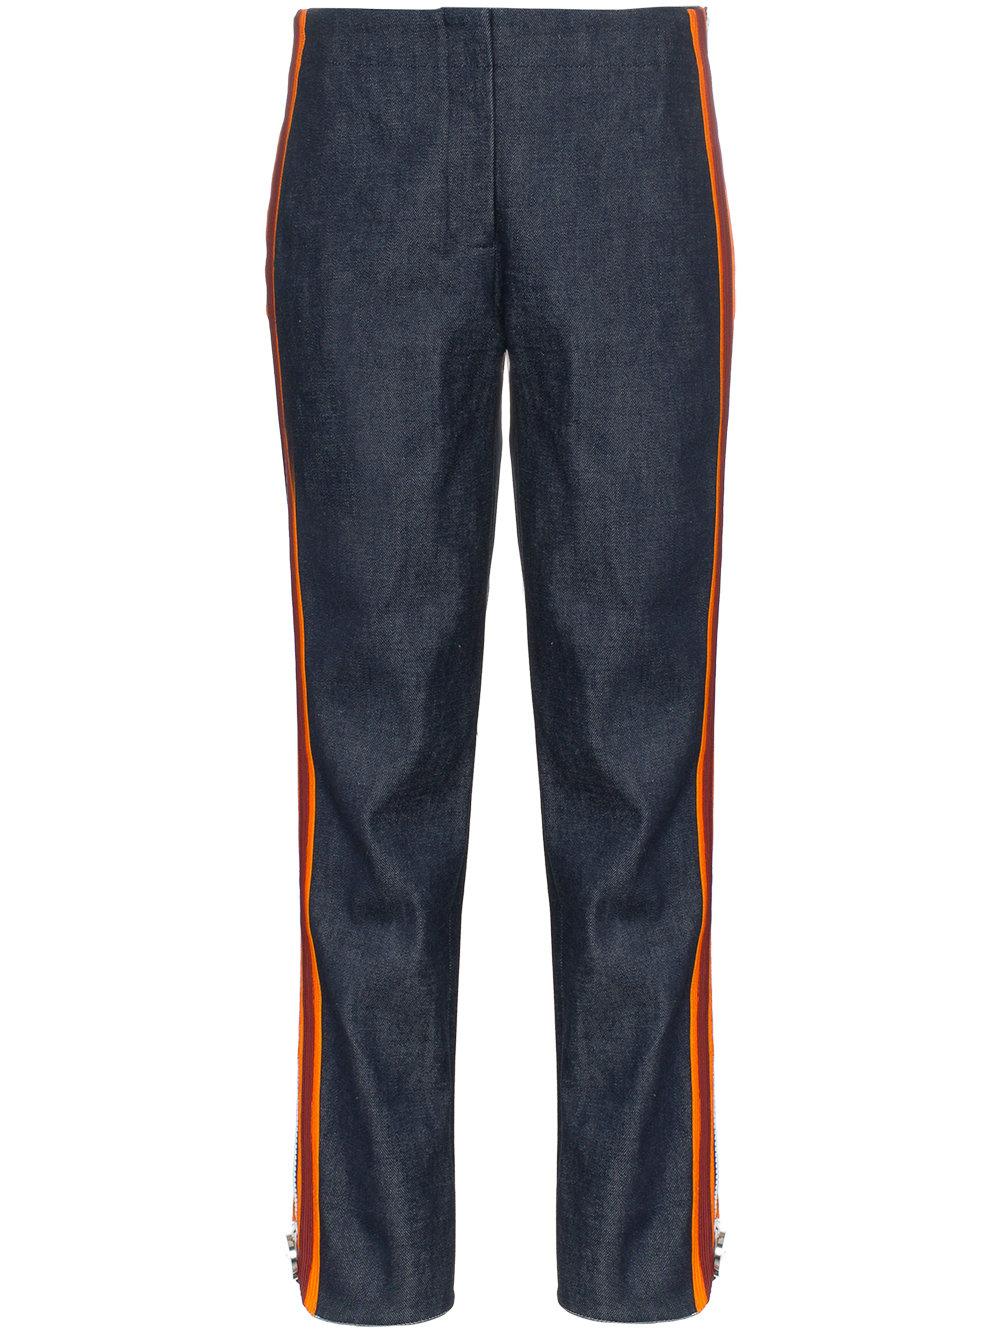 a3d424fafb8 Calvin Klein 205W39nyc high waist striped slim-fit jeans - Blue ...